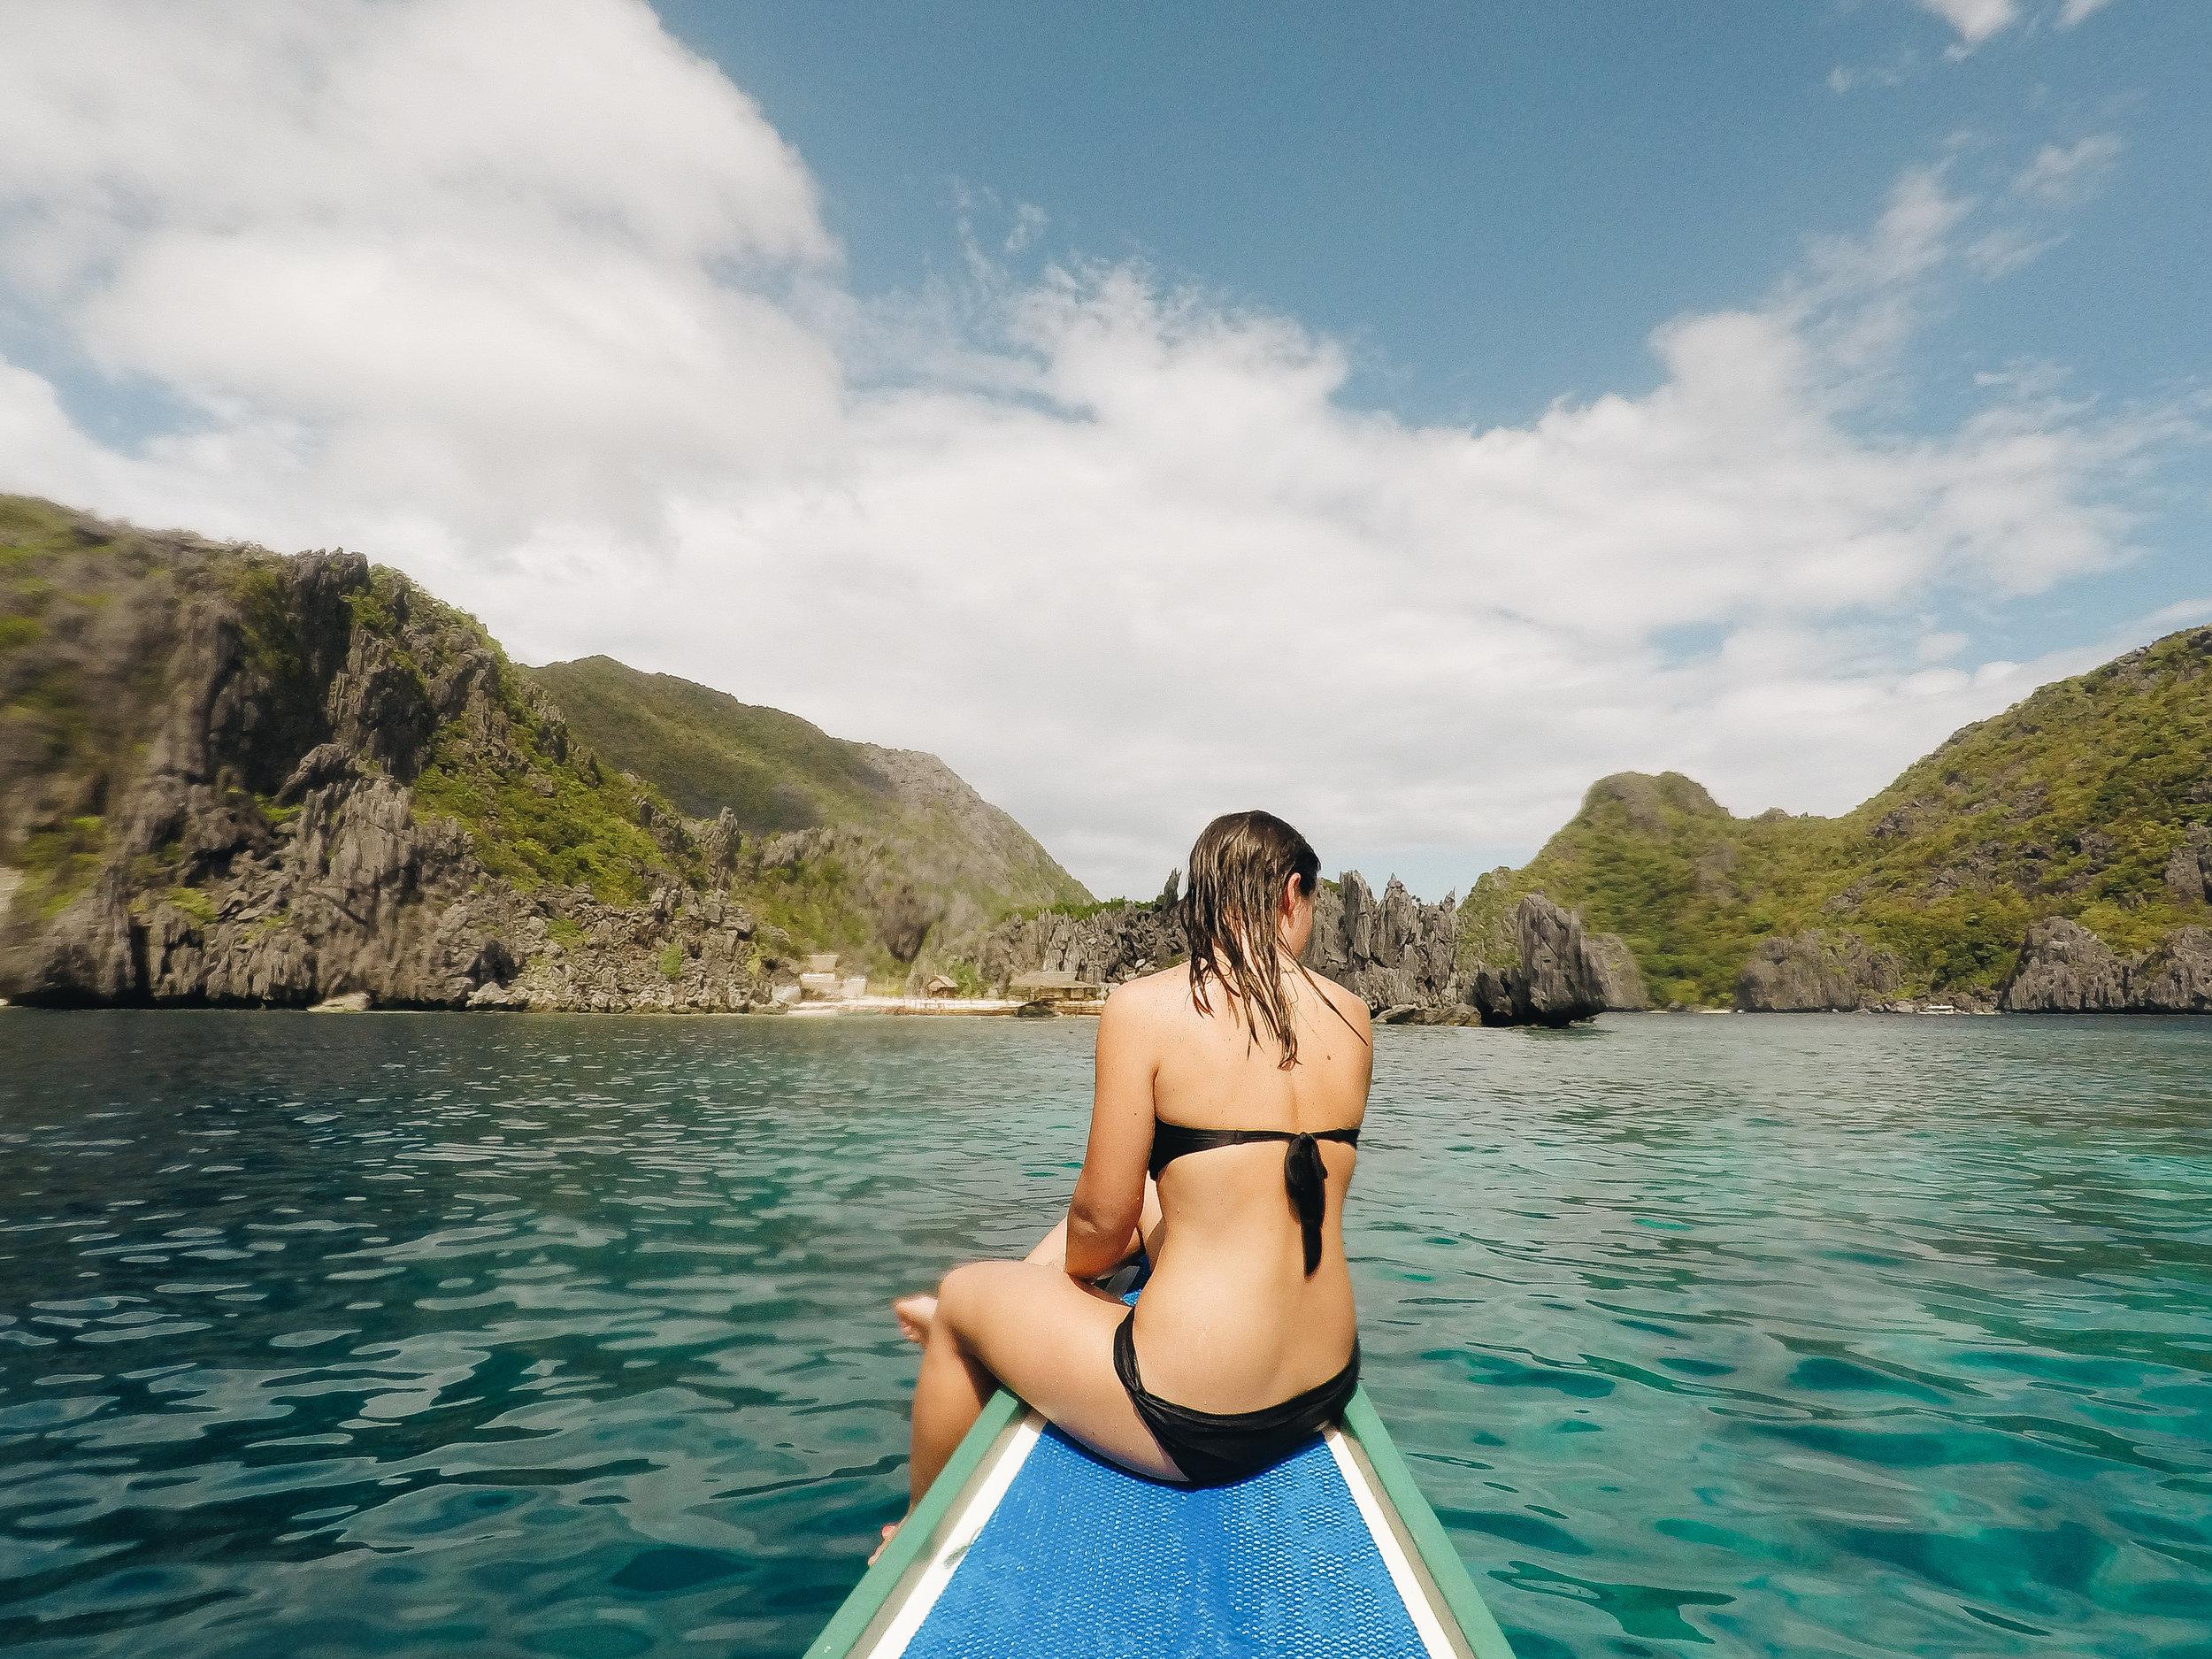 Tapiutan-island-snorkeling-TOUR-C-EL-NIDO-Philippines2.jpg